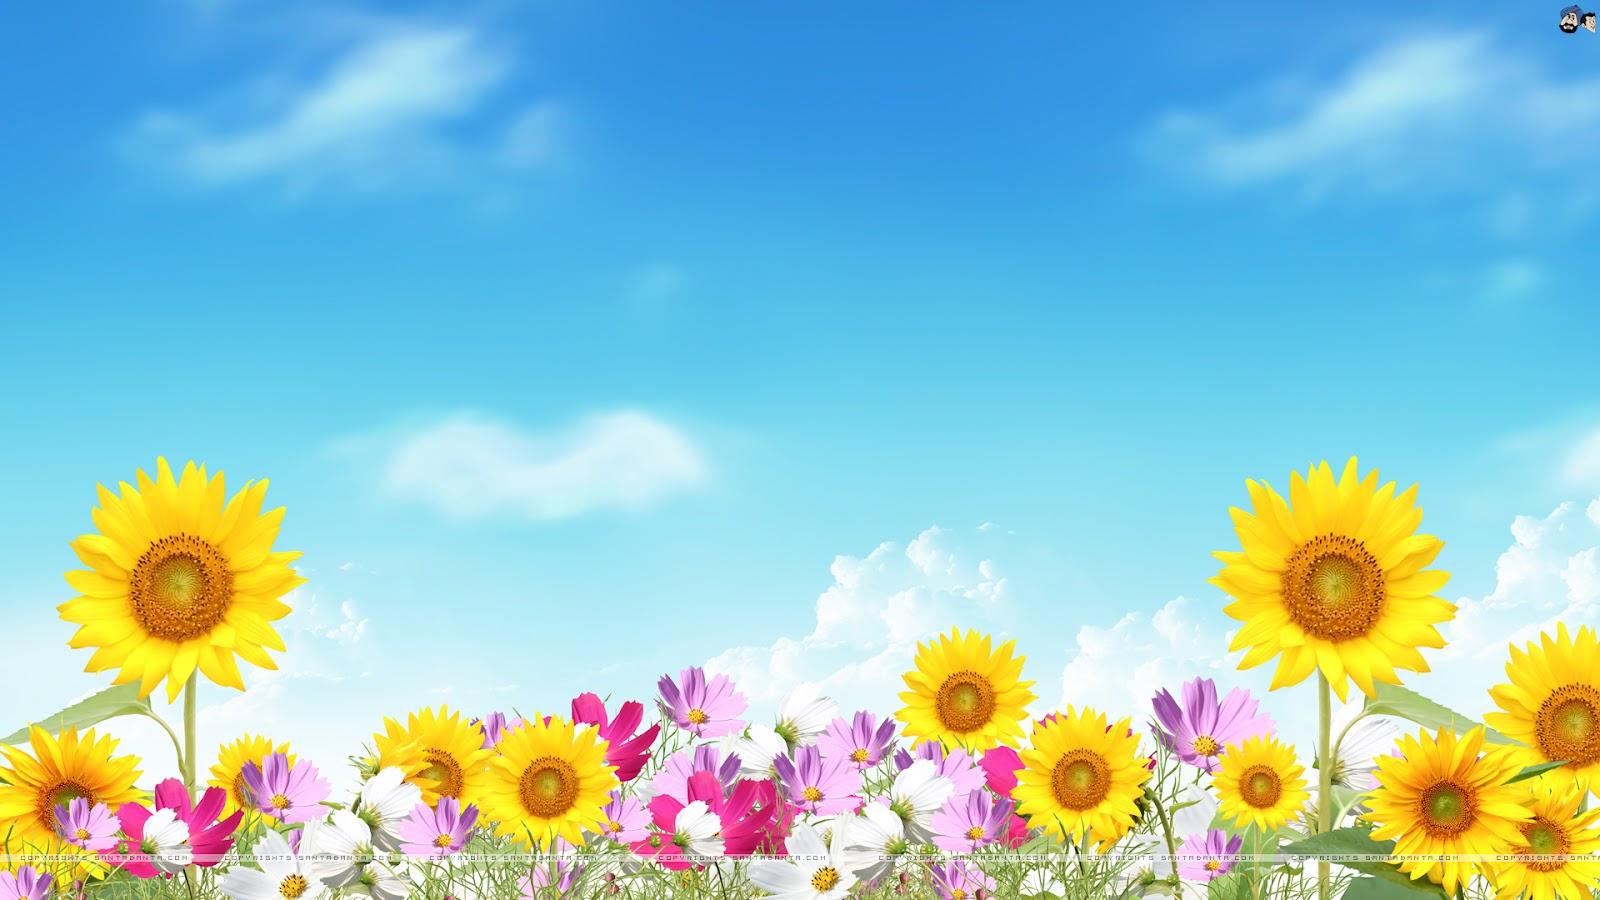 Kids Under 7 Summer Wallpapers for Desktop 1600x900